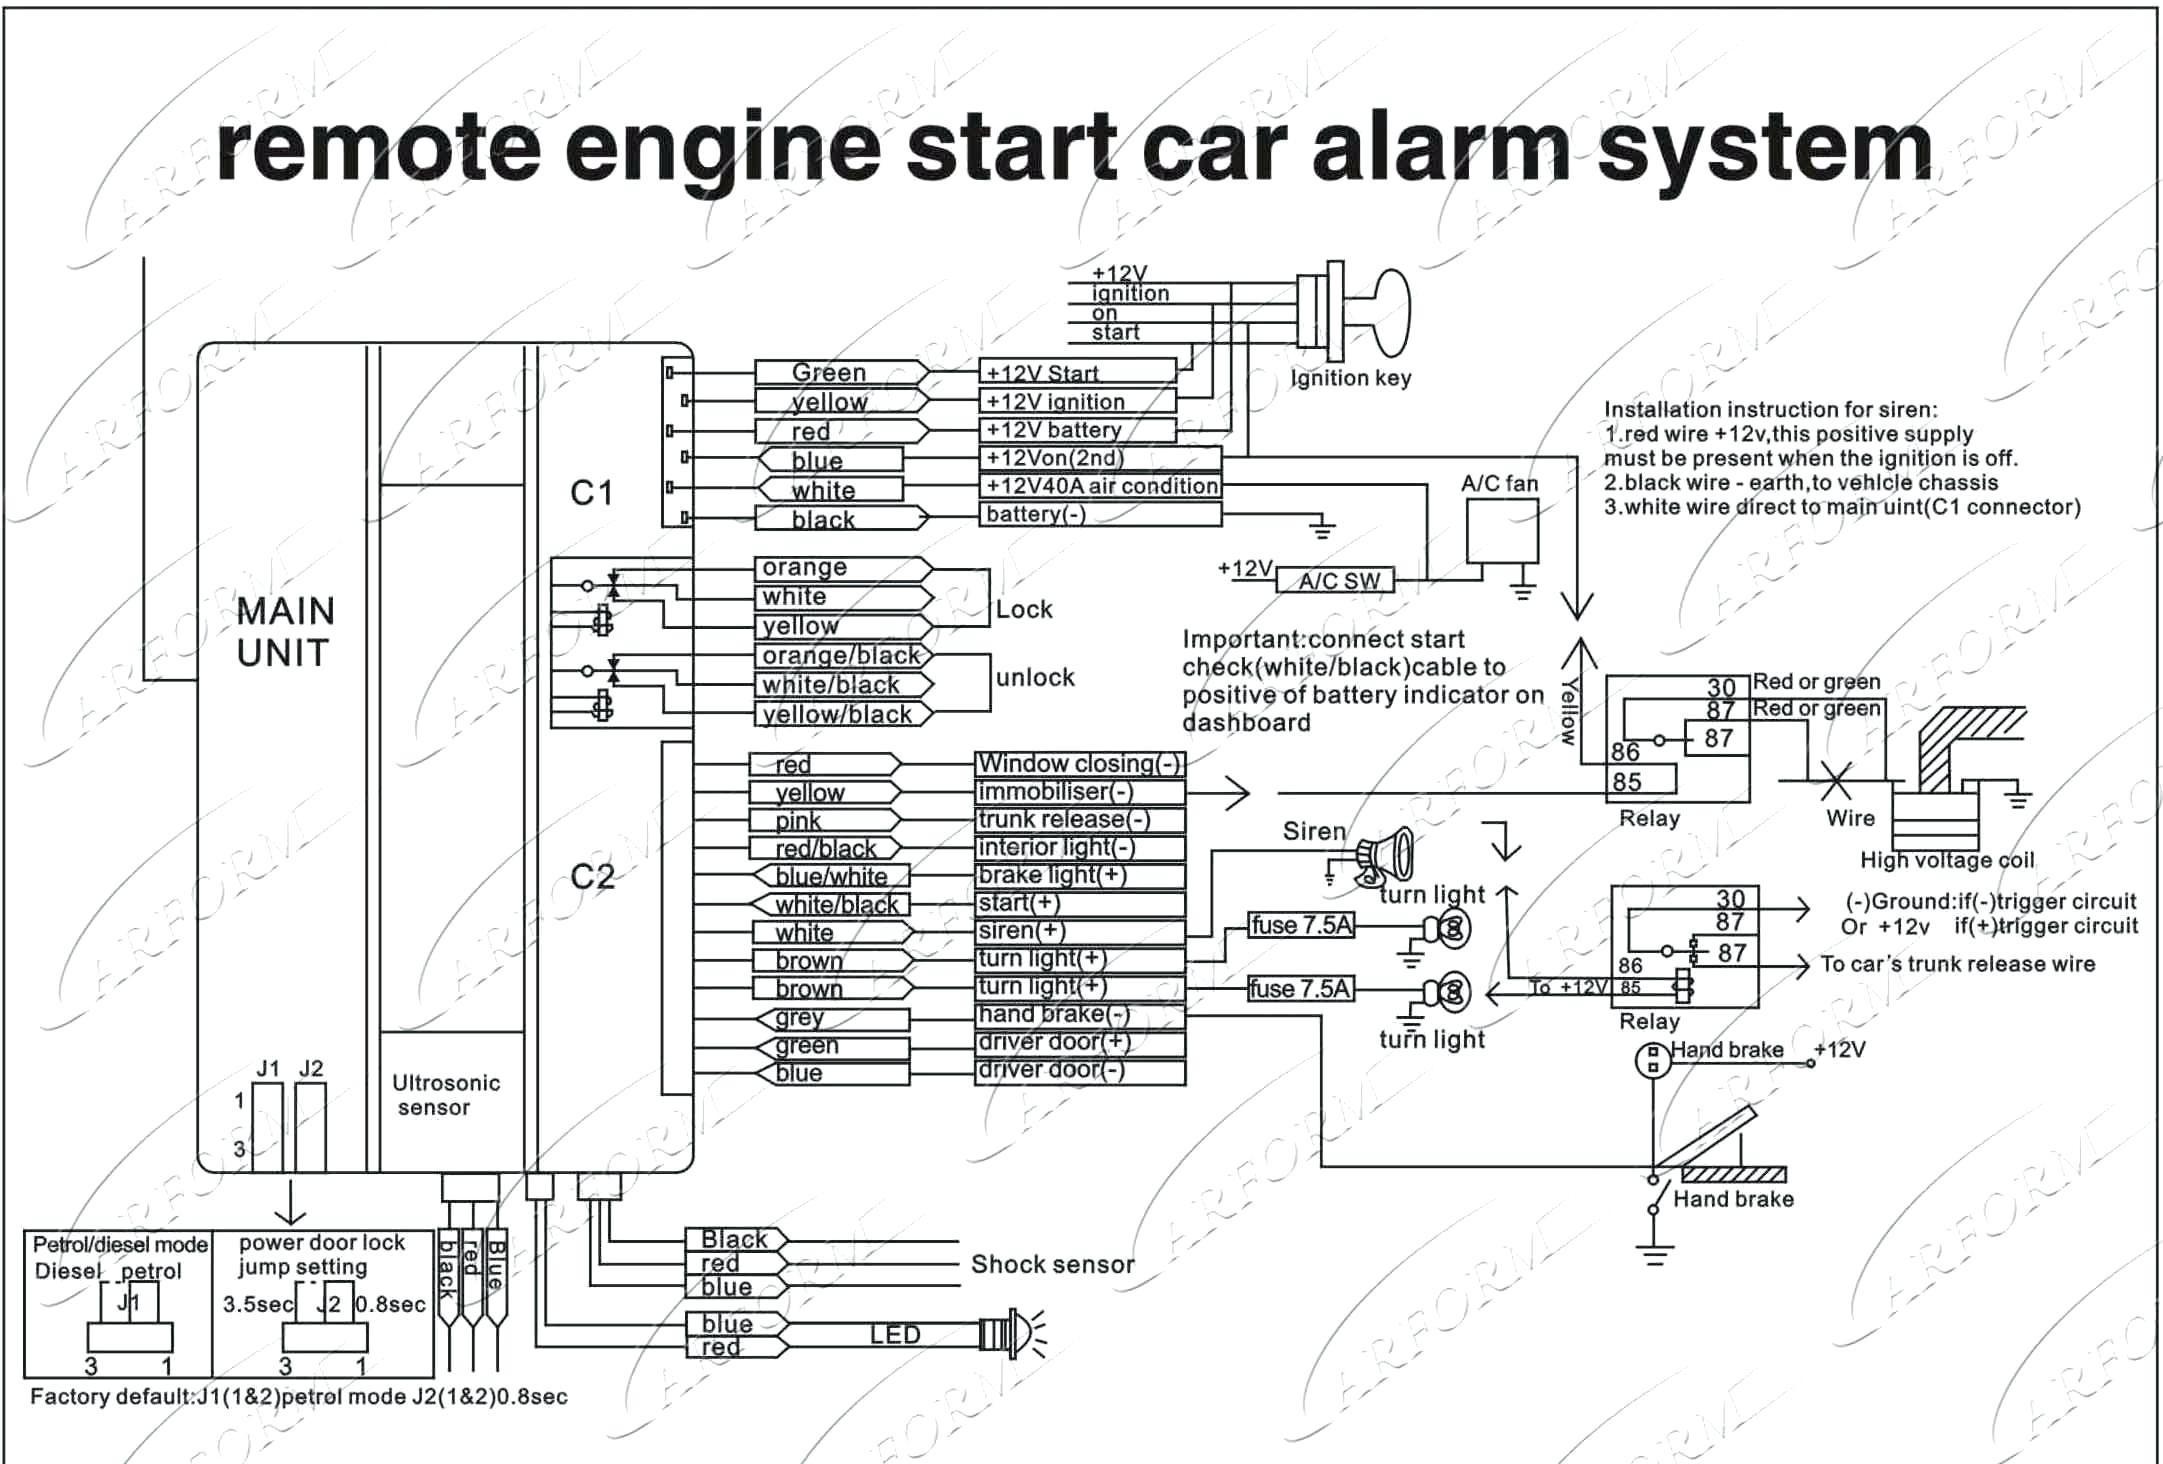 Car Security System Wiring Diagram Viper Alarm System Wiring Diagram Wiring Diagram toolbox Of Car Security System Wiring Diagram